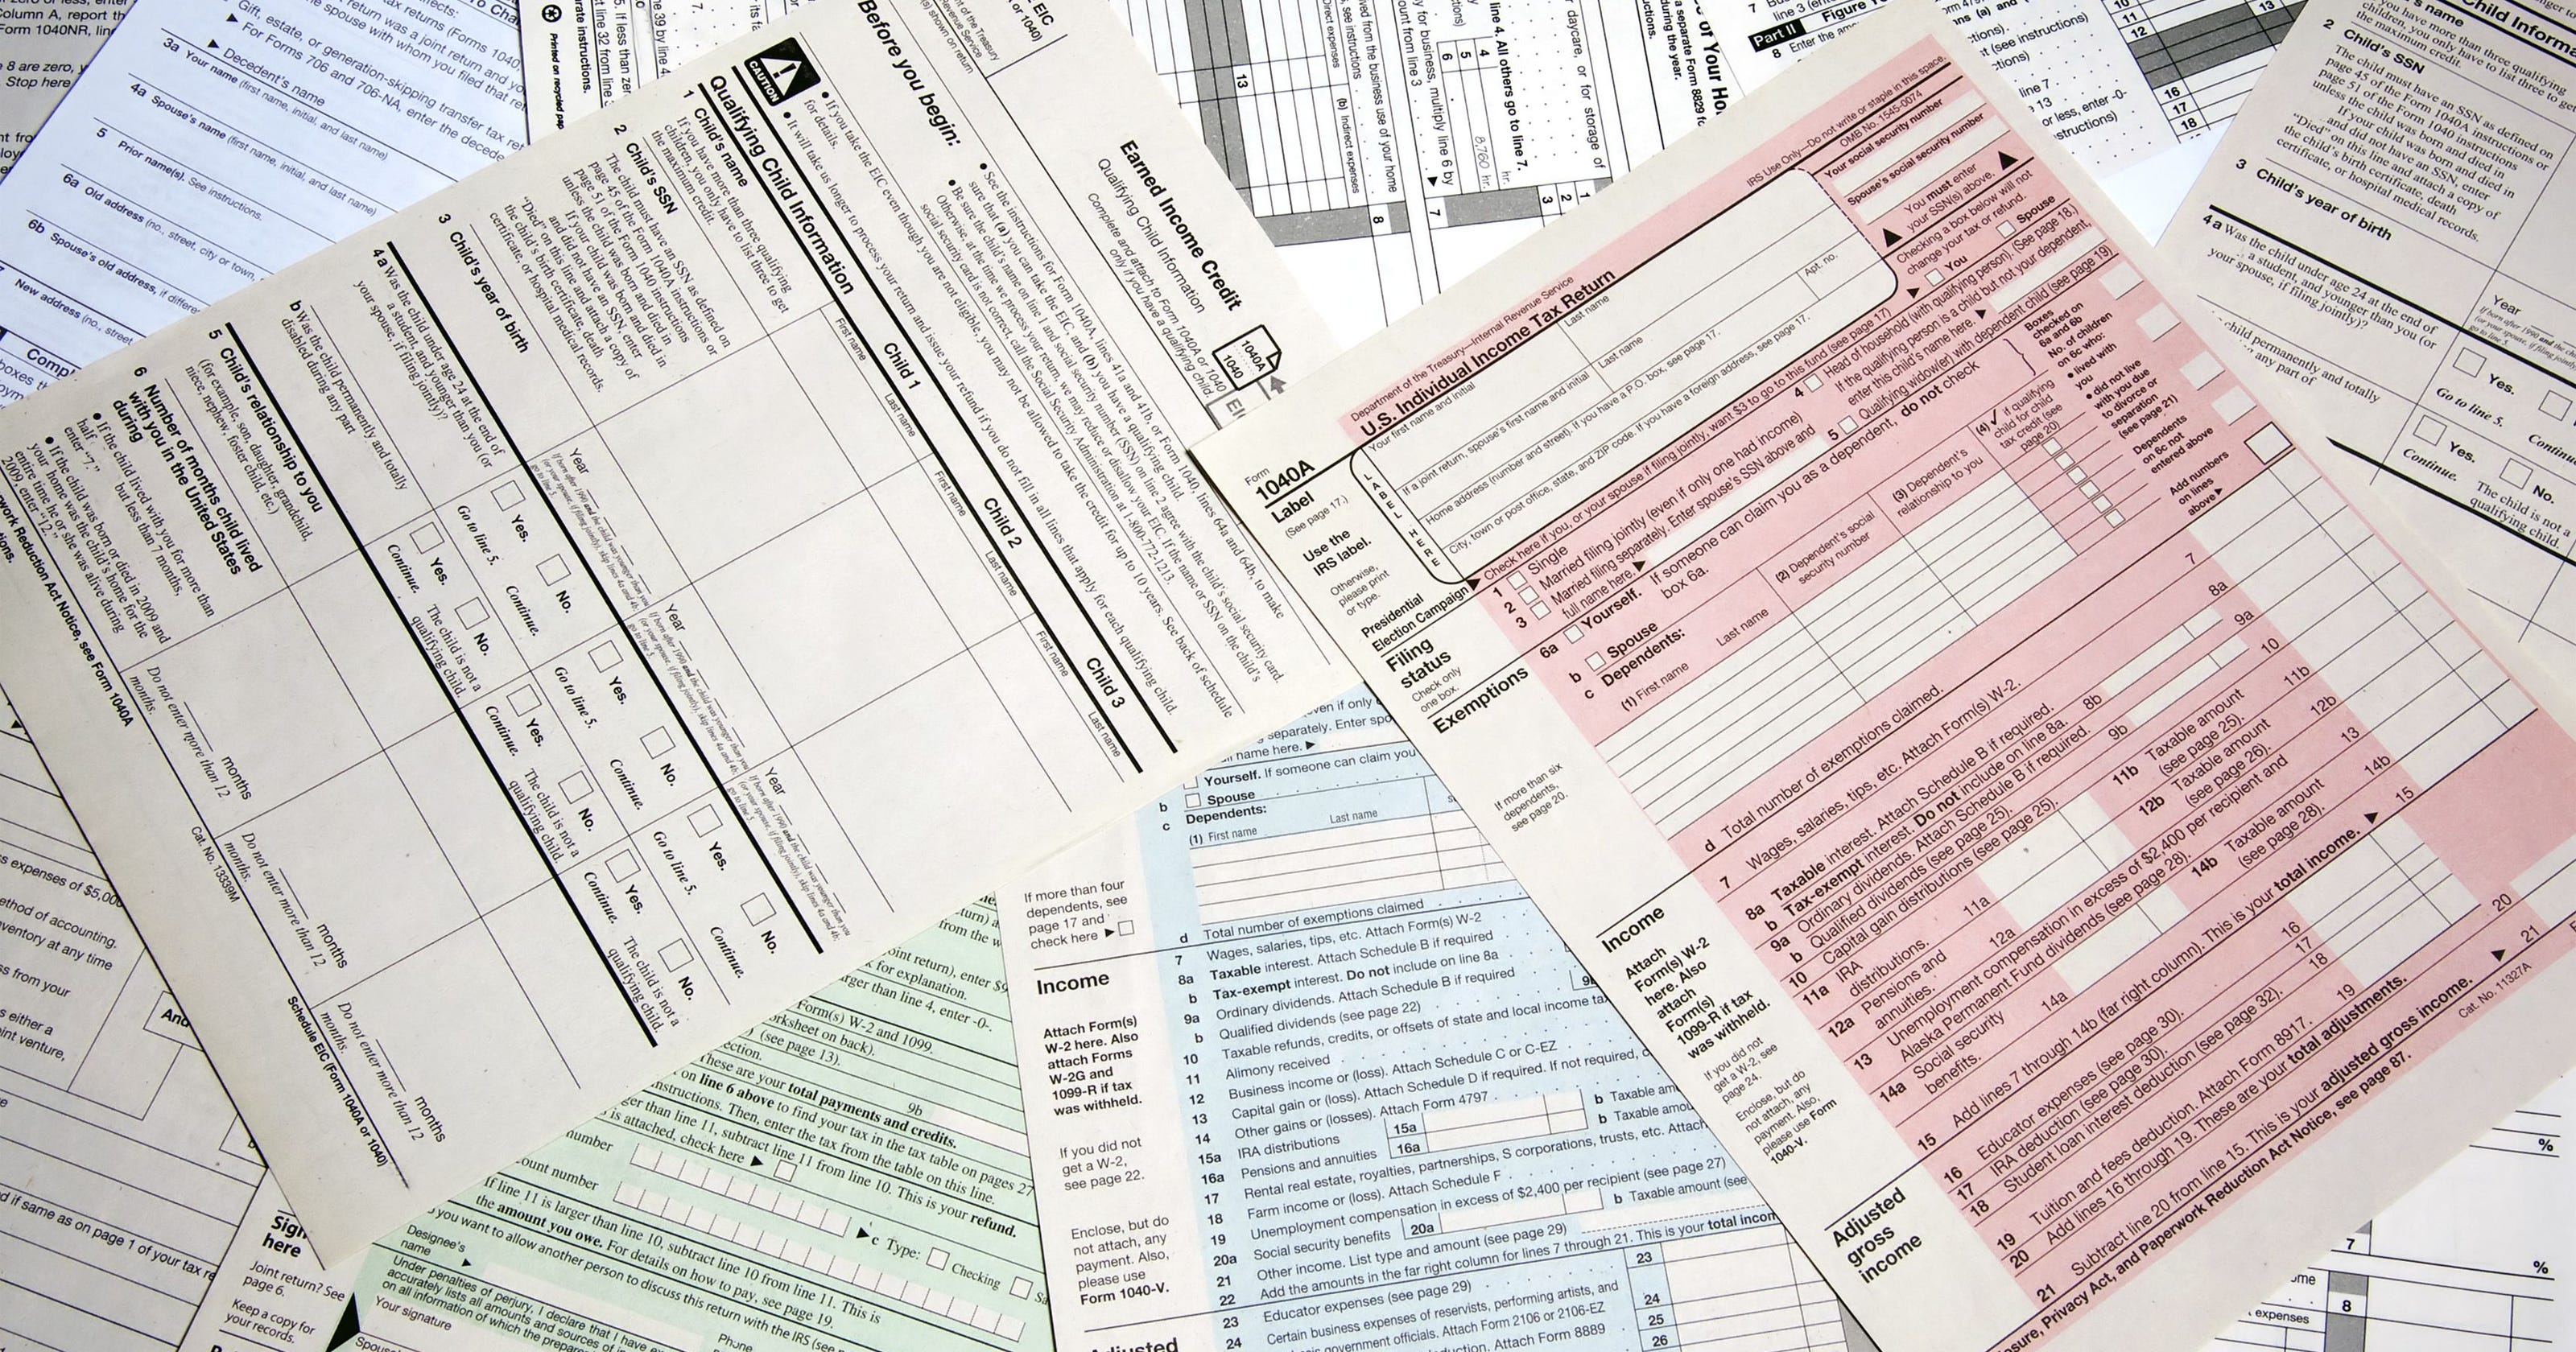 Big backlog on refund checks due to COVID-19 pandemic